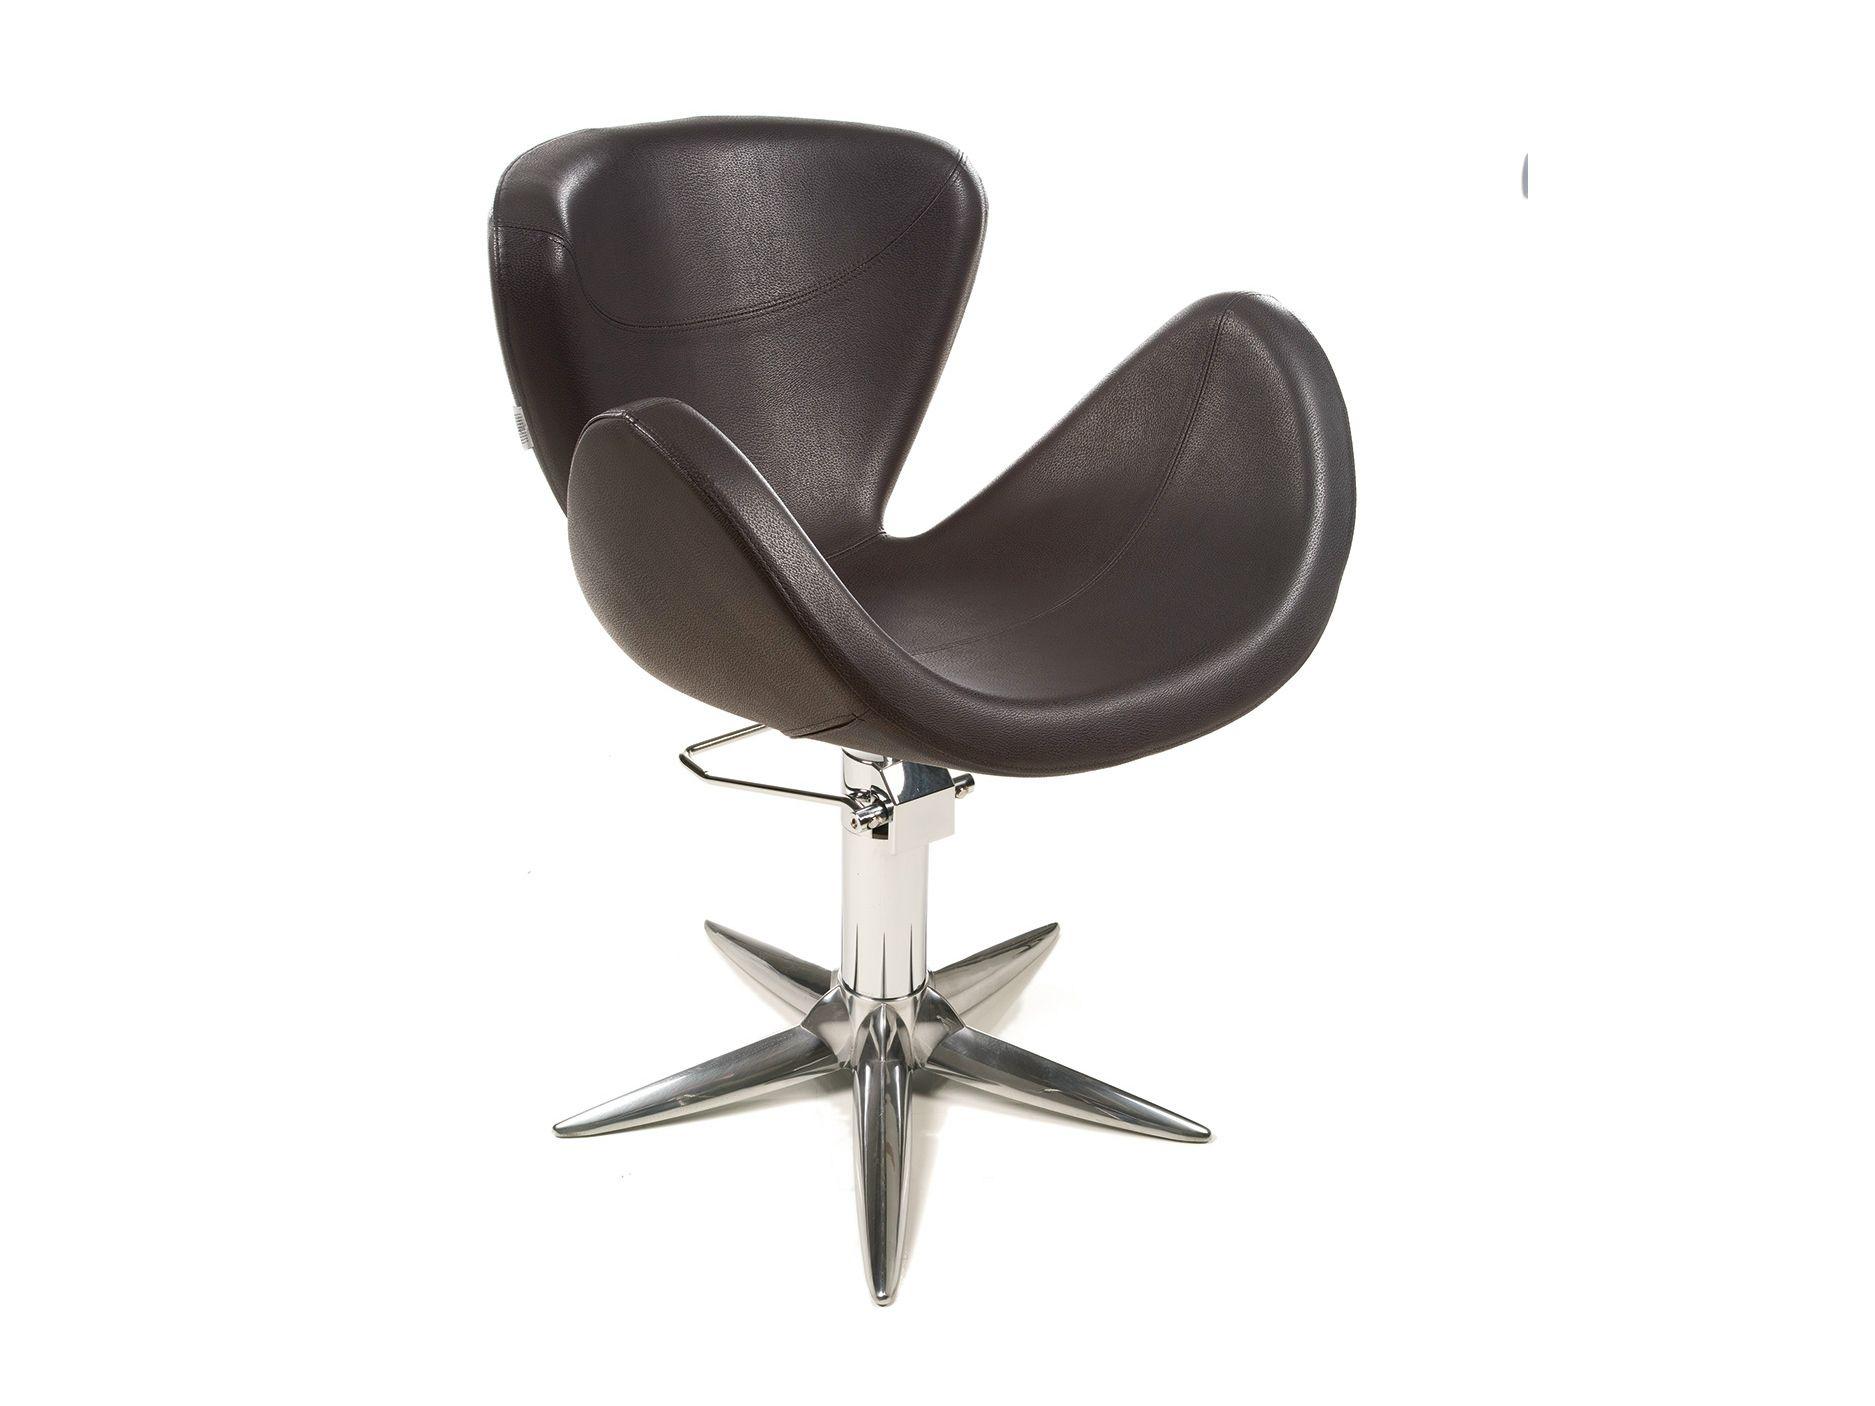 hairdresser chair rikka anniversary giugiaro design line by gamma bross design giugiaro design. Black Bedroom Furniture Sets. Home Design Ideas